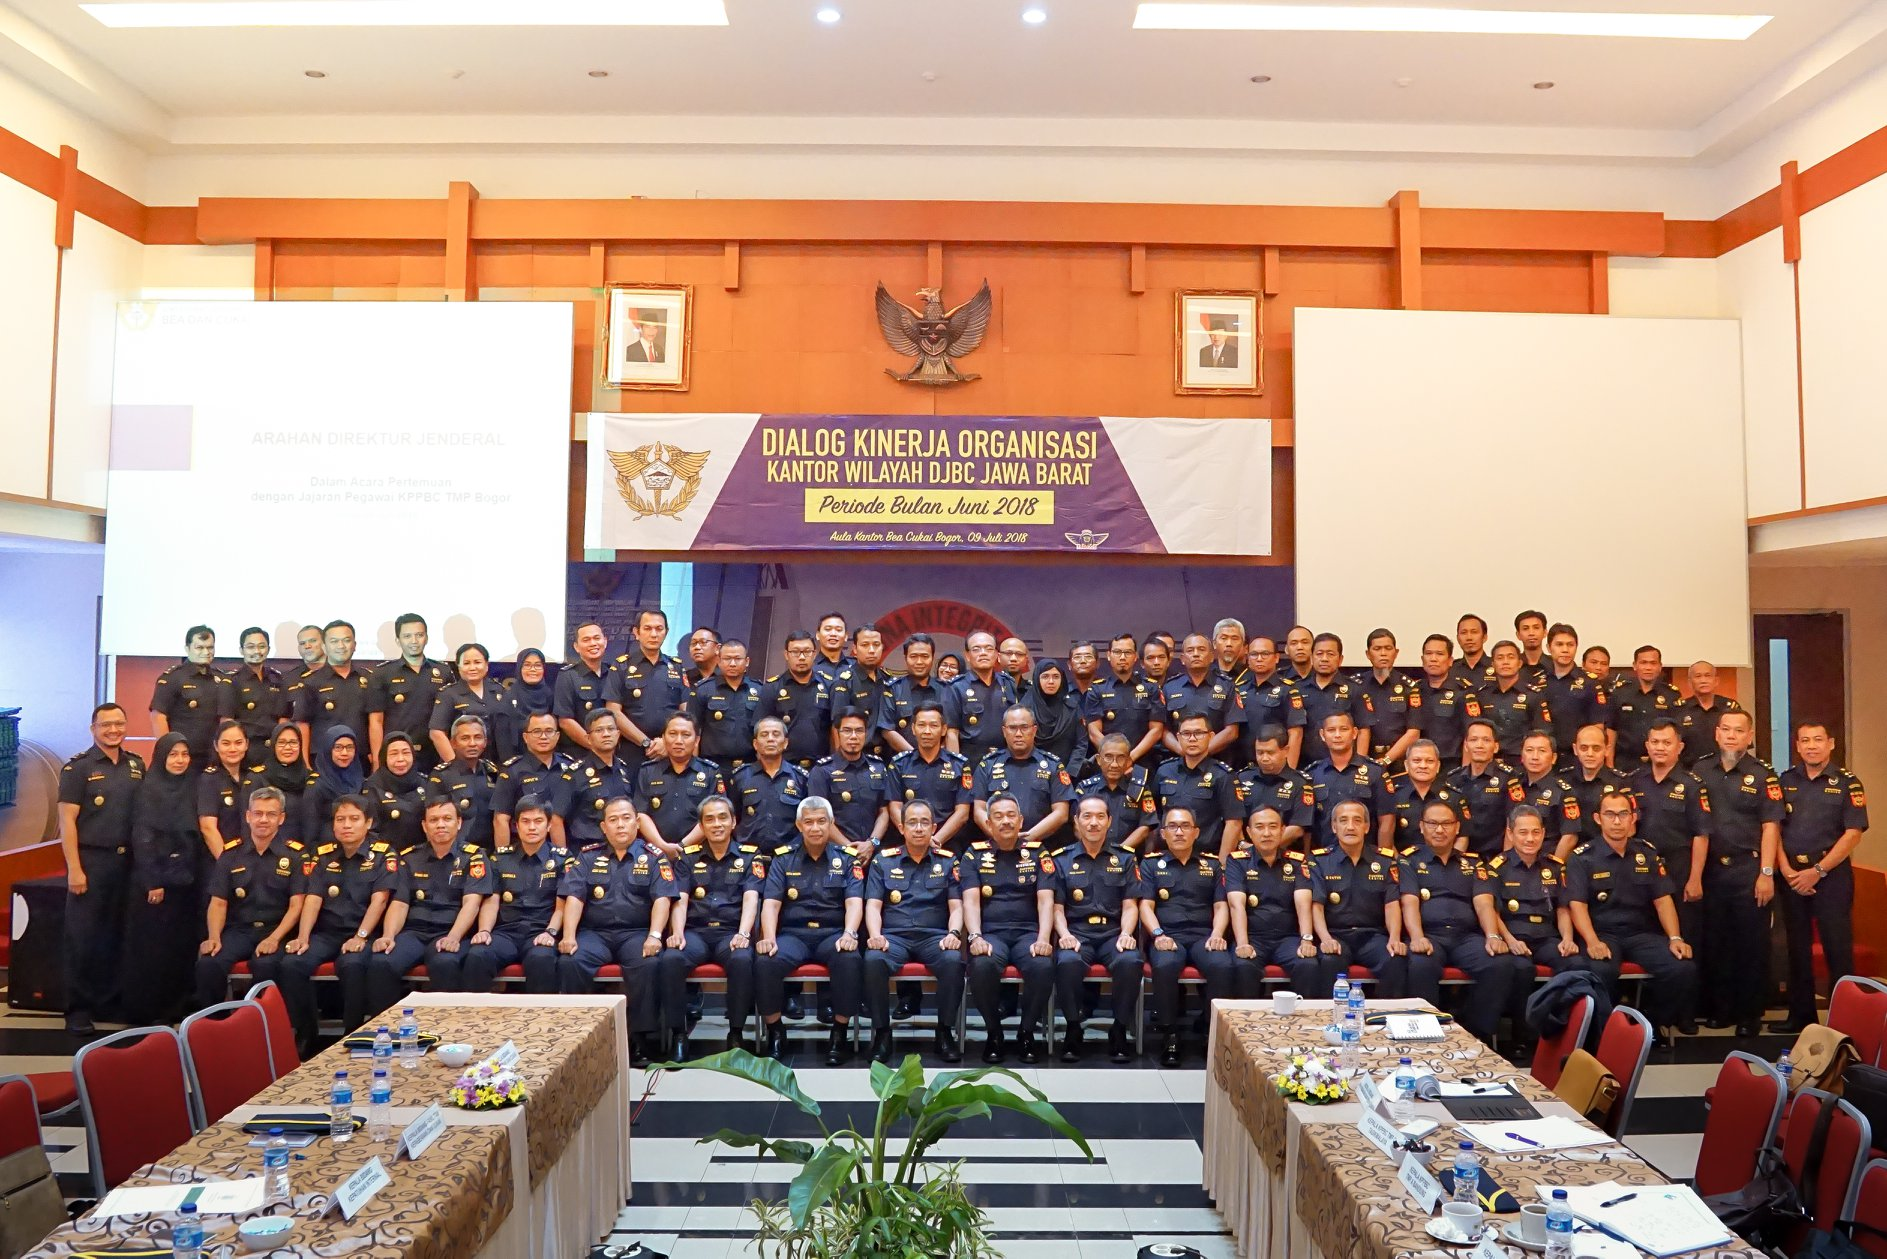 Bogor (09 07 2018) – Direktur Jenderal Bea dan Cukai 9d981333af